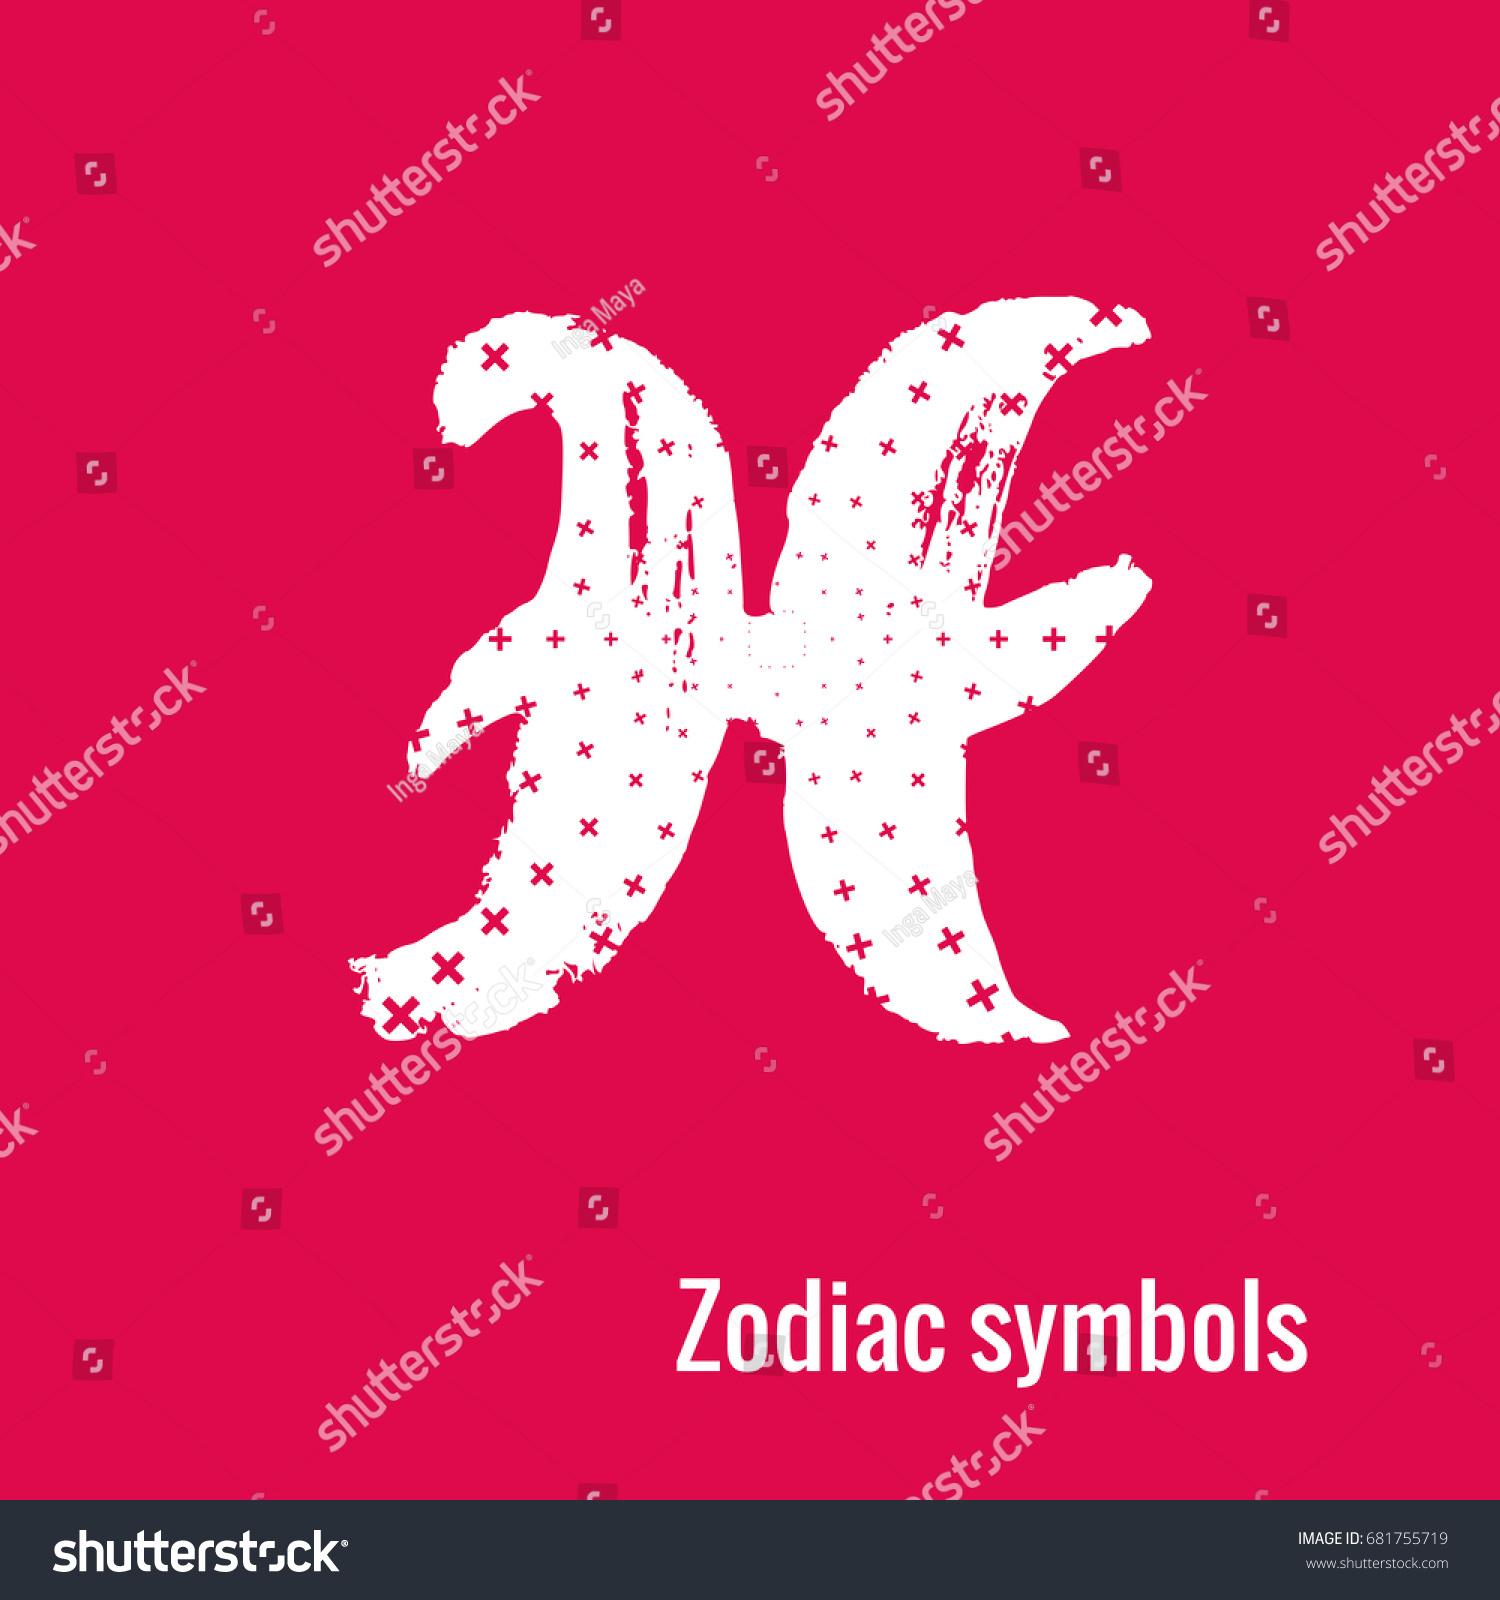 Signs zodiac gemini symbol calligraphy fashion stock vector gemini symbol calligraphy fashion illustration style vector illustration white buycottarizona